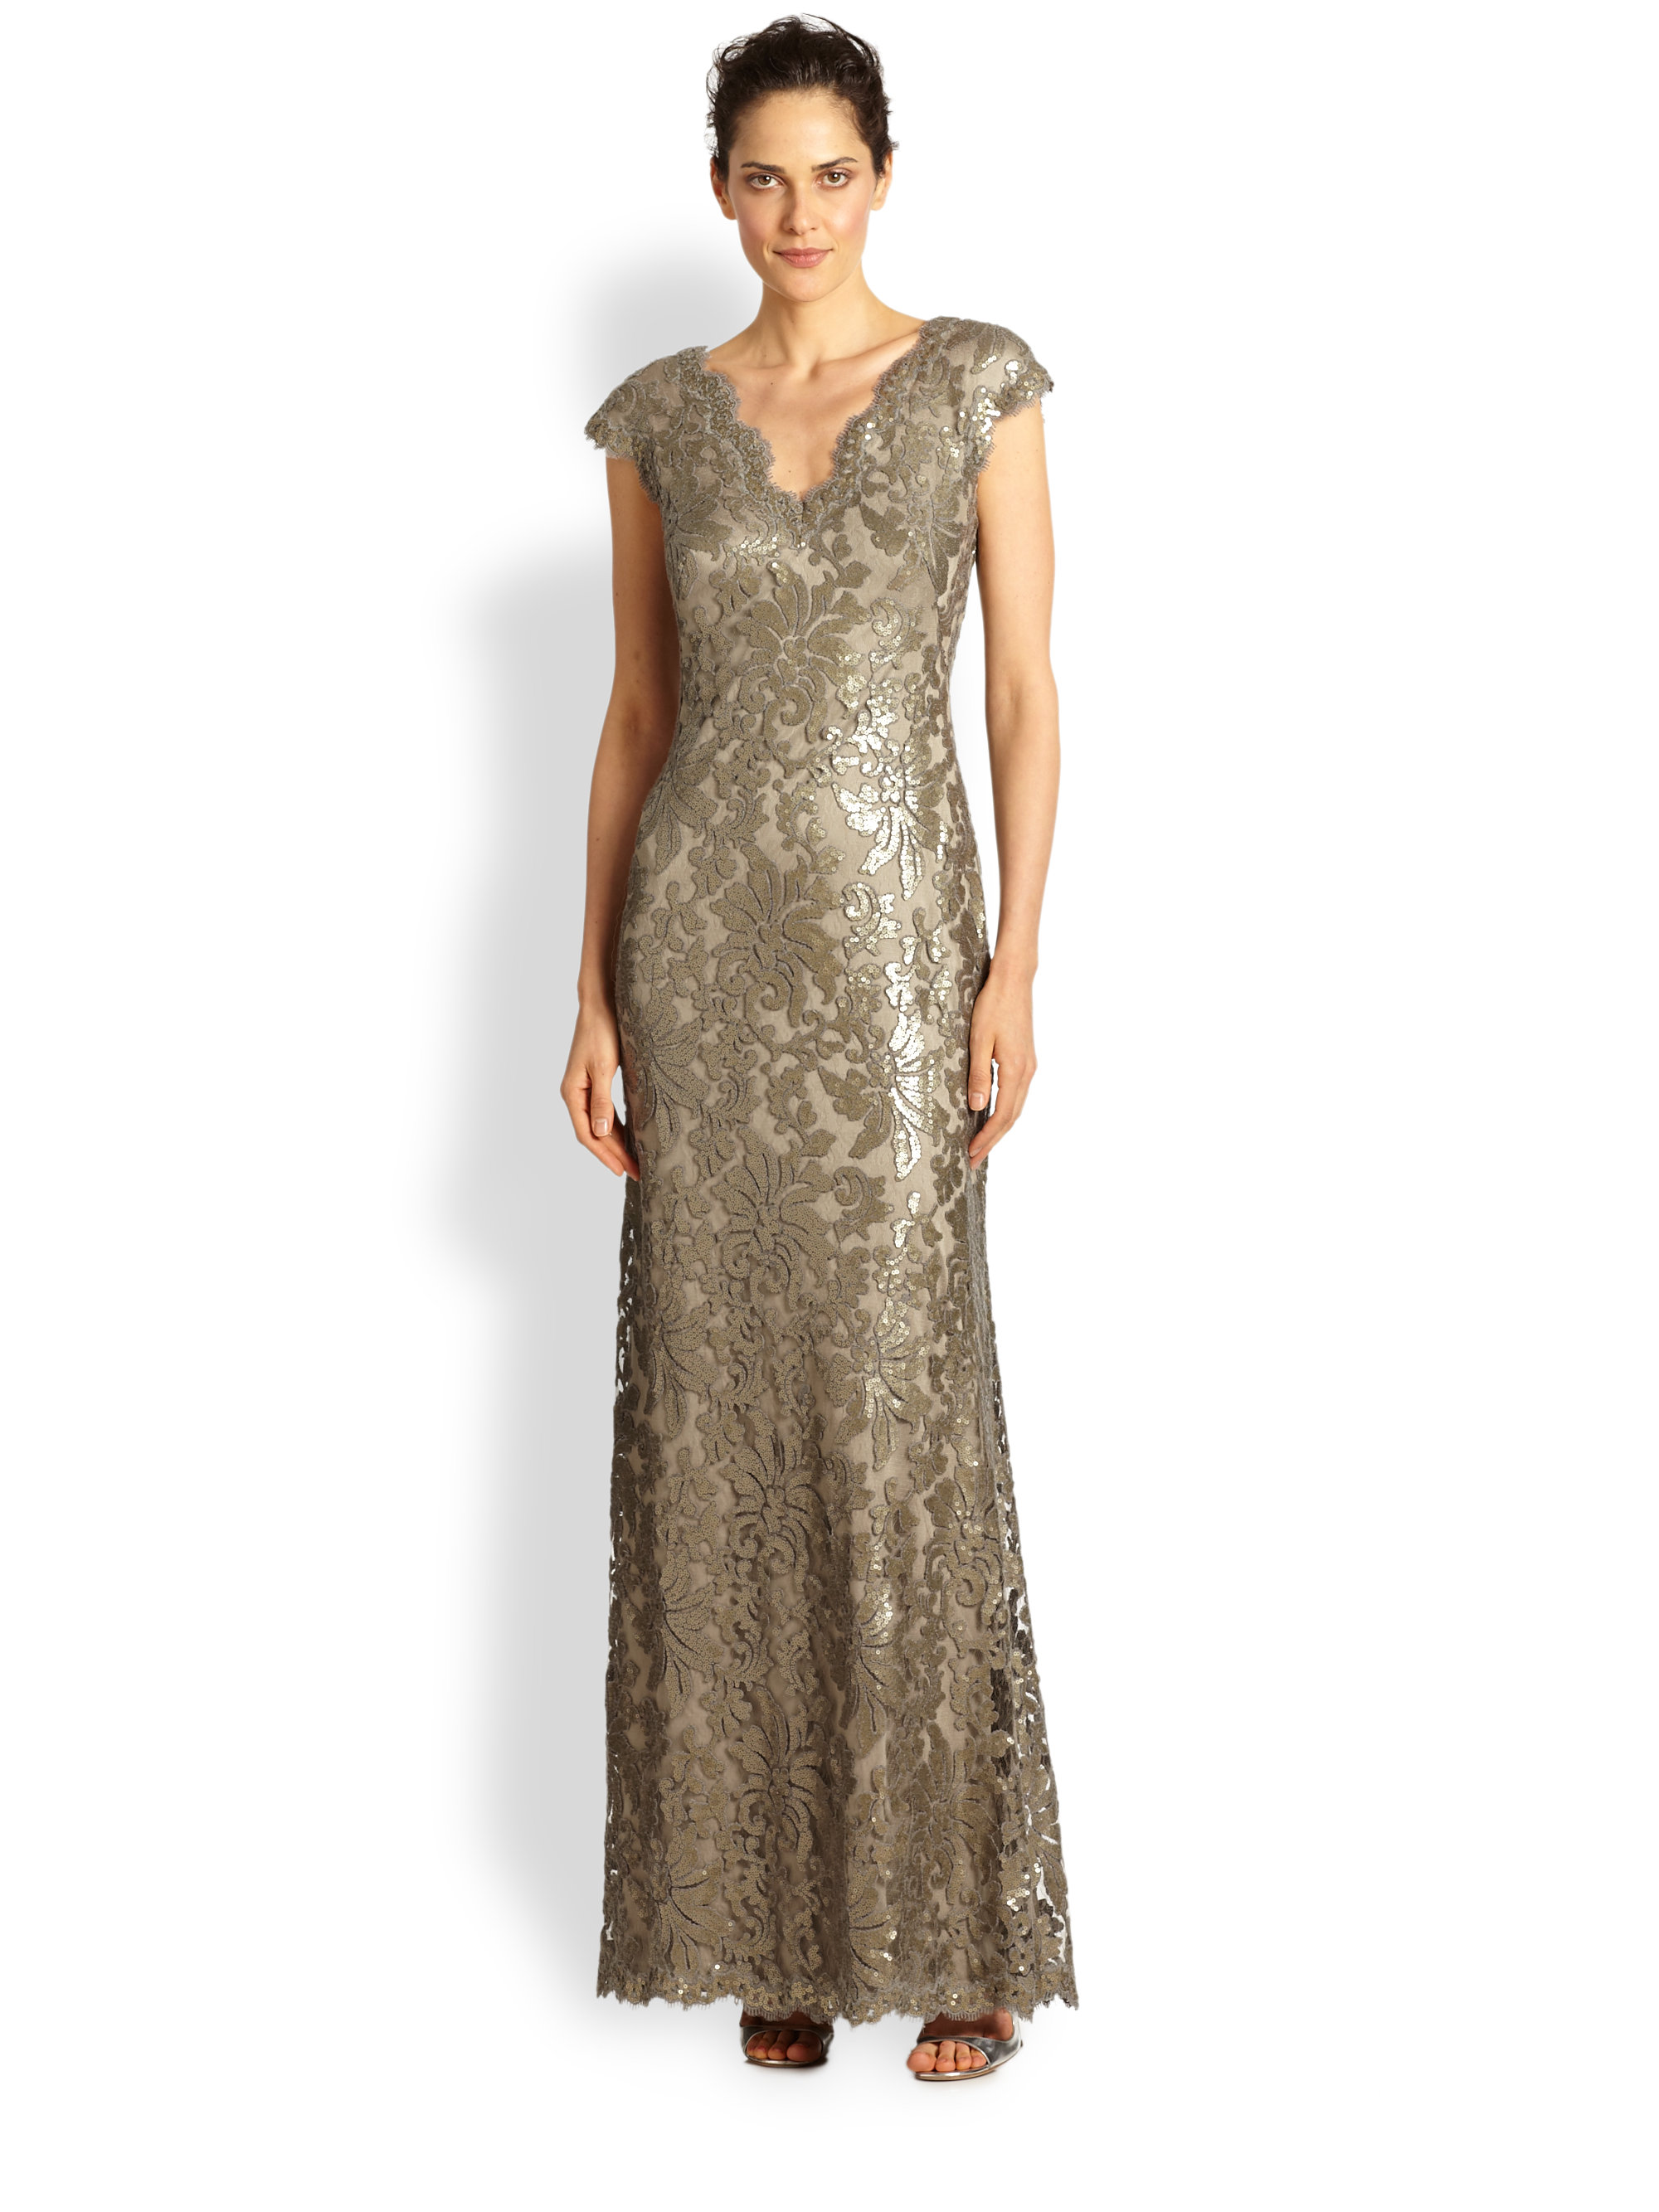 Tadashi Shoji Sequin Lace Gown ( Size 14P) | eBay